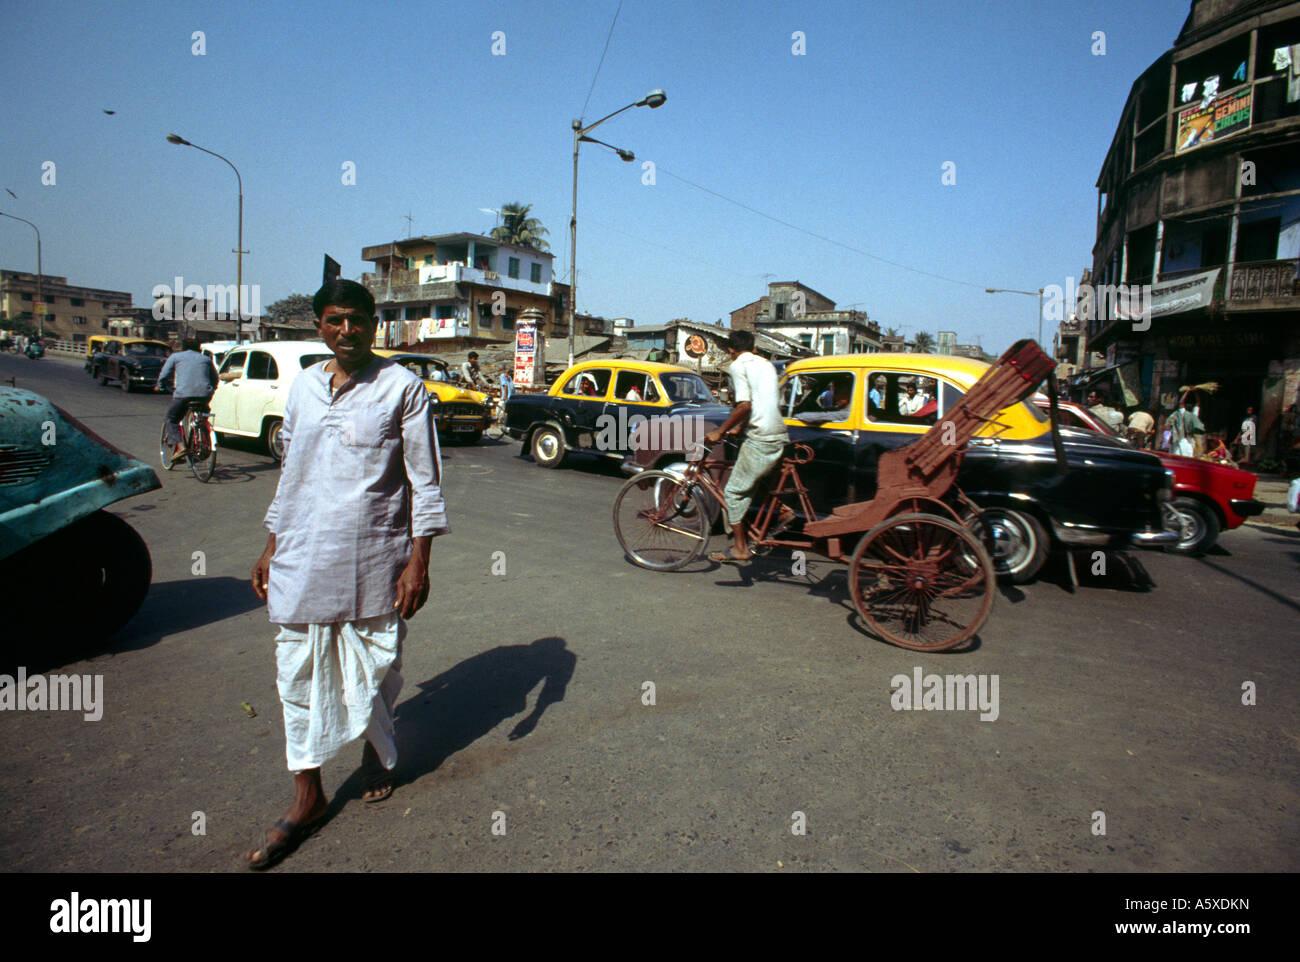 kolkata India Street With Hindustan Ambassador Cars - Stock Image